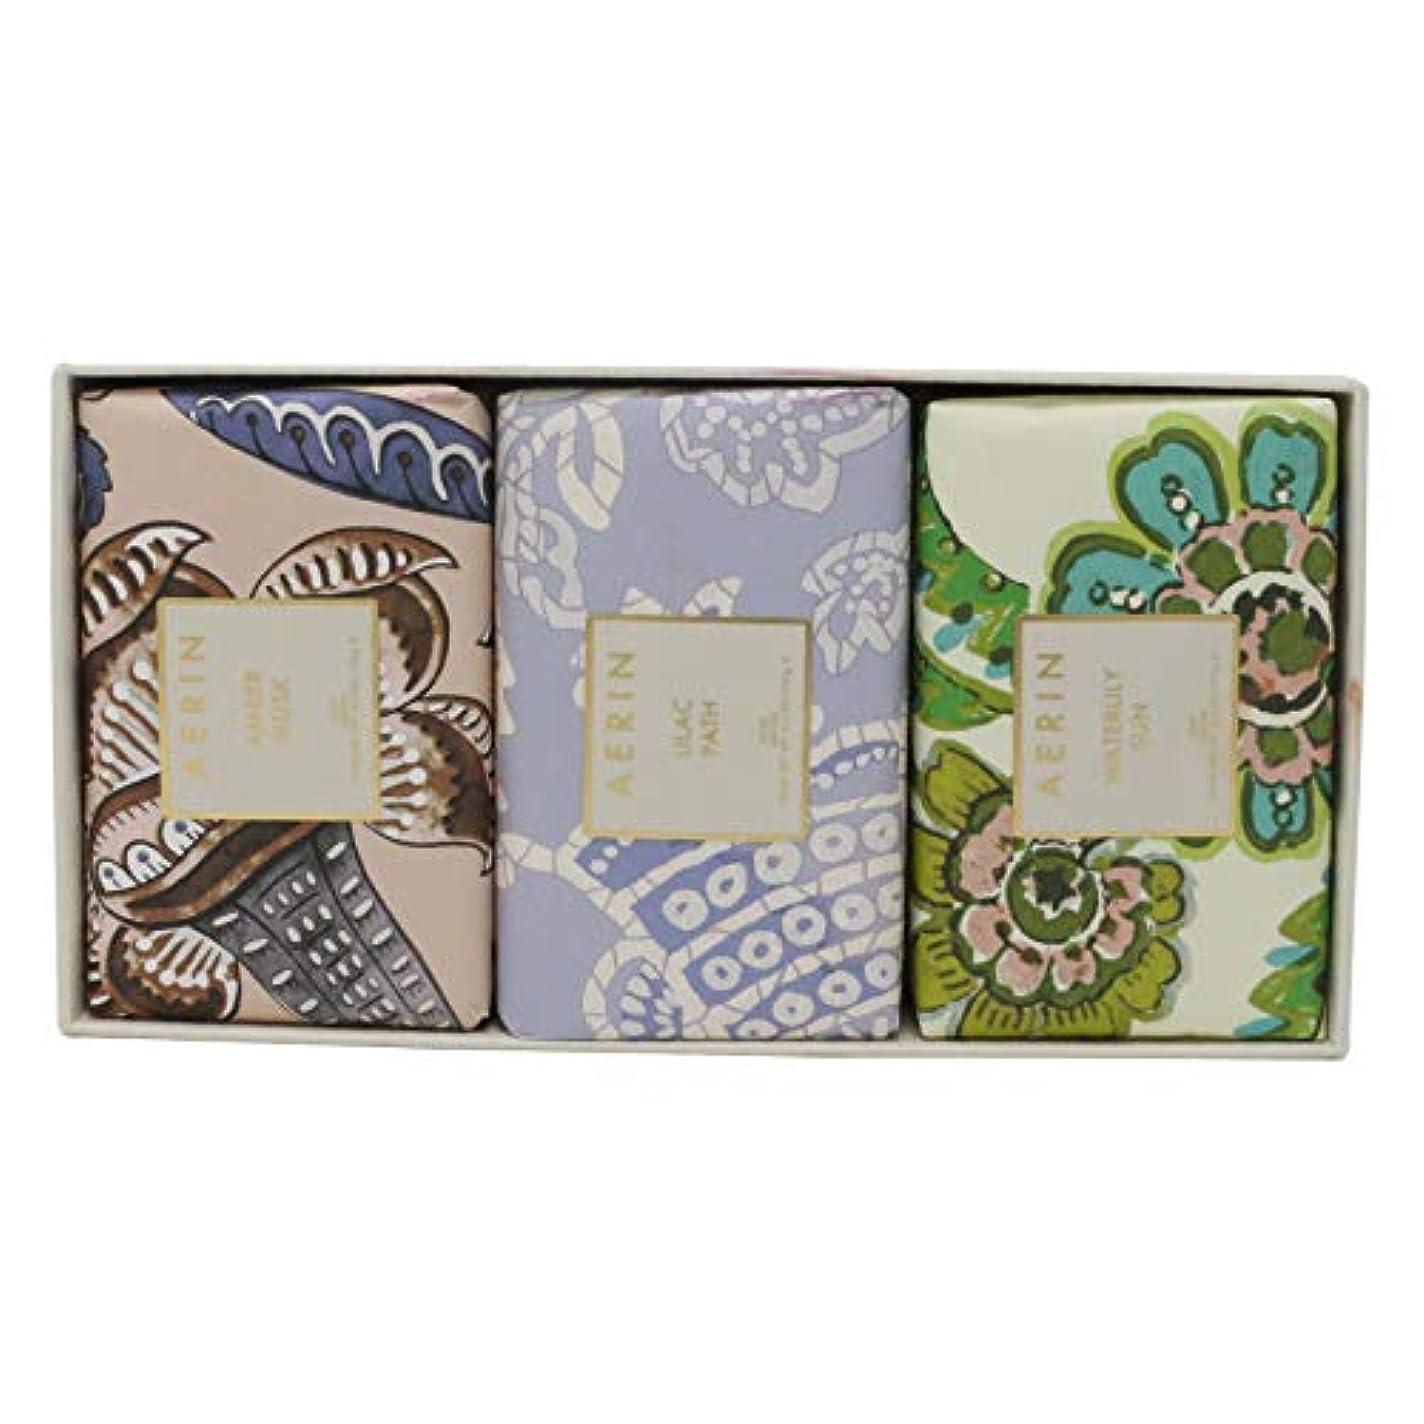 AERIN Beauty Soap Coffret(アエリン ビューティー ソープ コフレット ) 6.2 oz (186ml) Soap 固形石鹸 x 3個セットby Estee Lauder